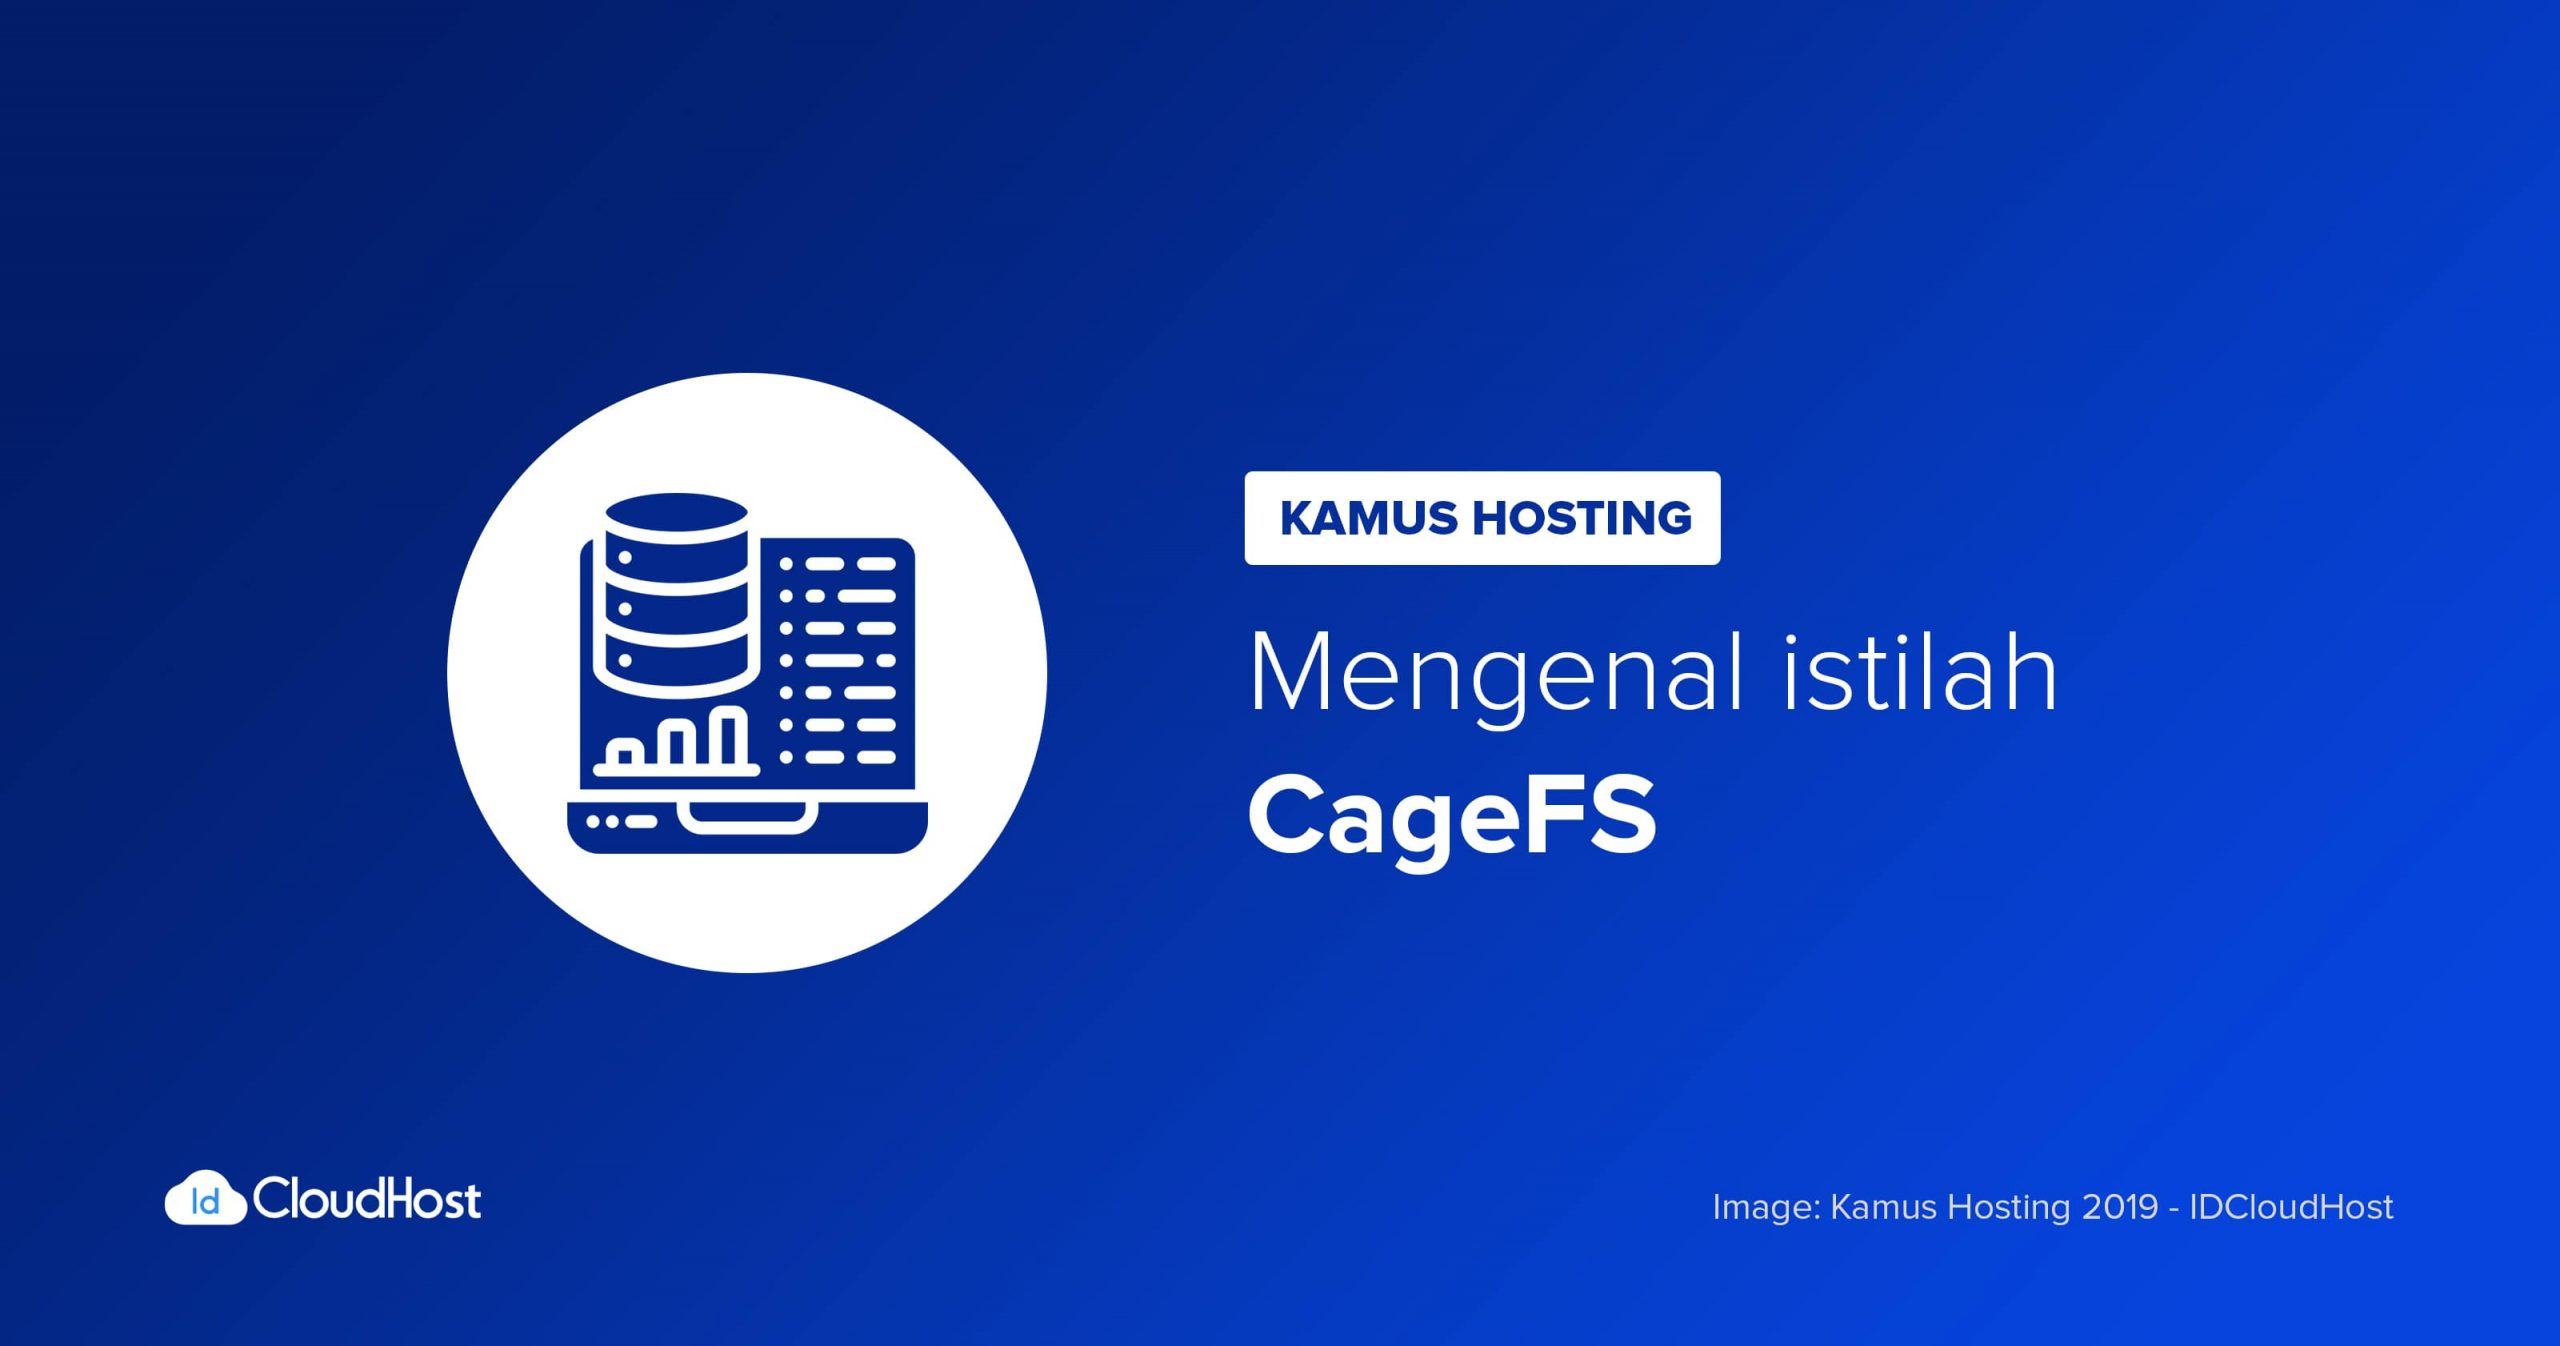 CageFS